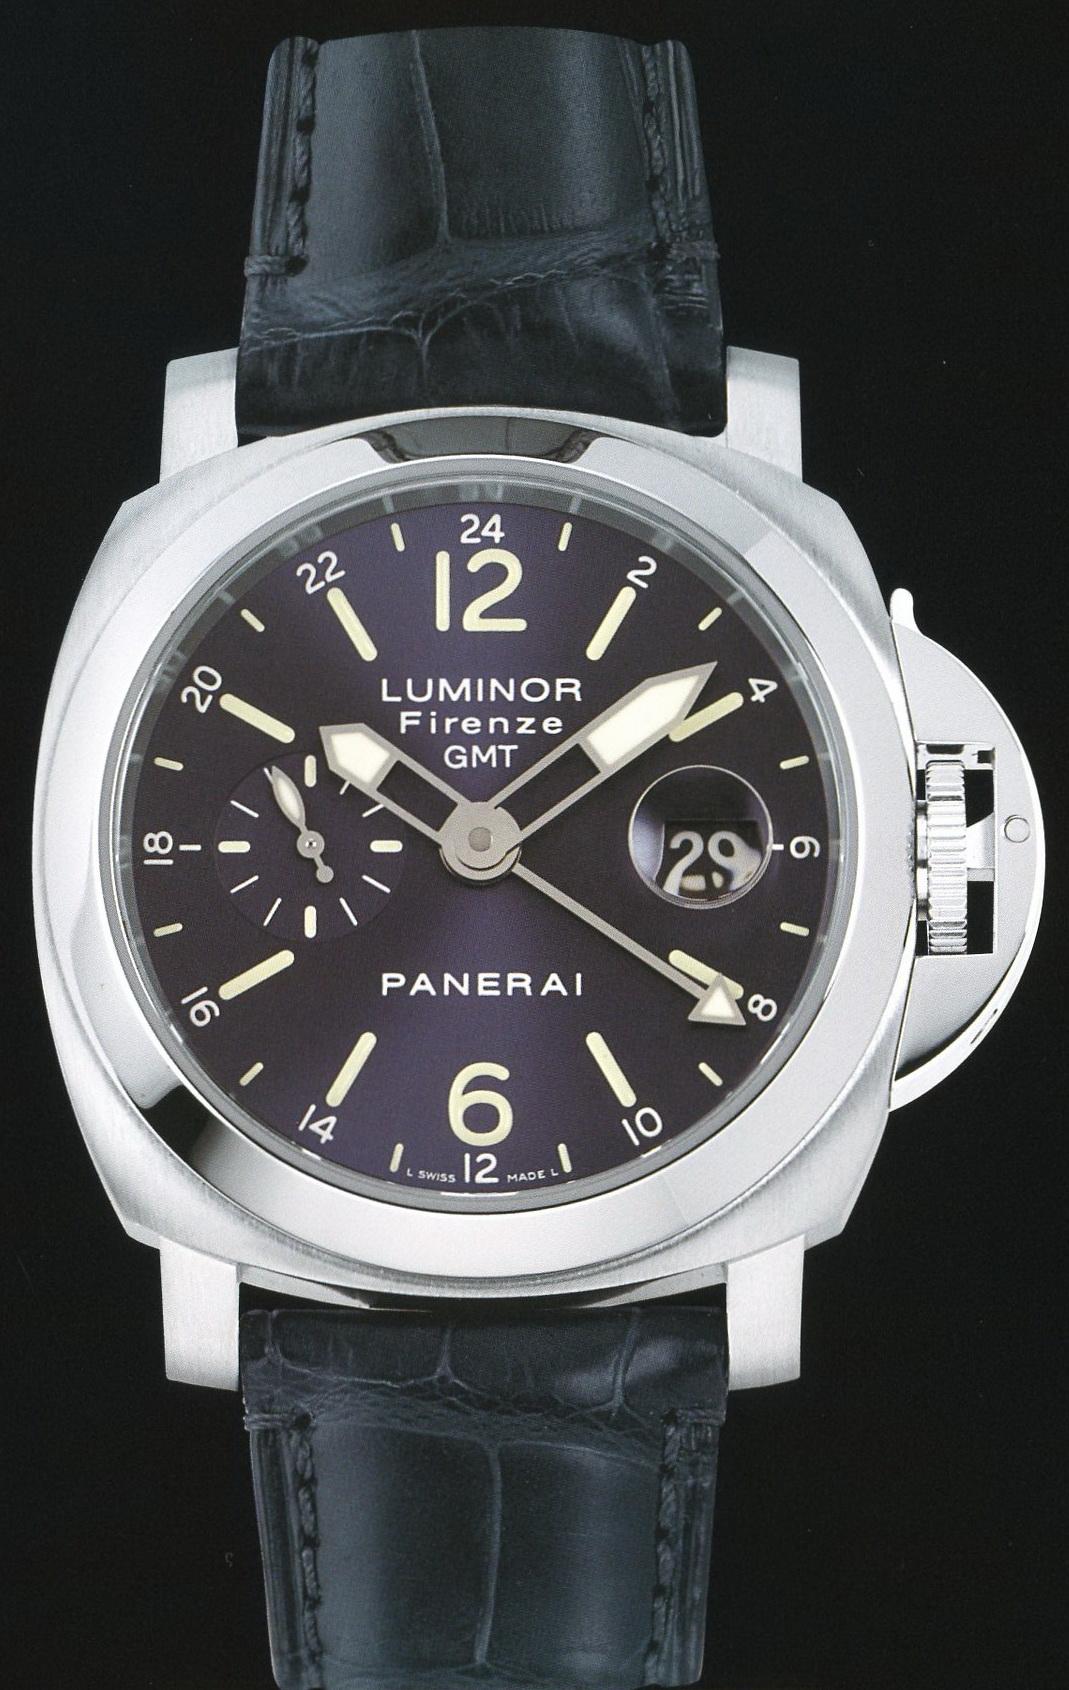 часы Panerai 2005 Special Edition Luminor GMT Firenze